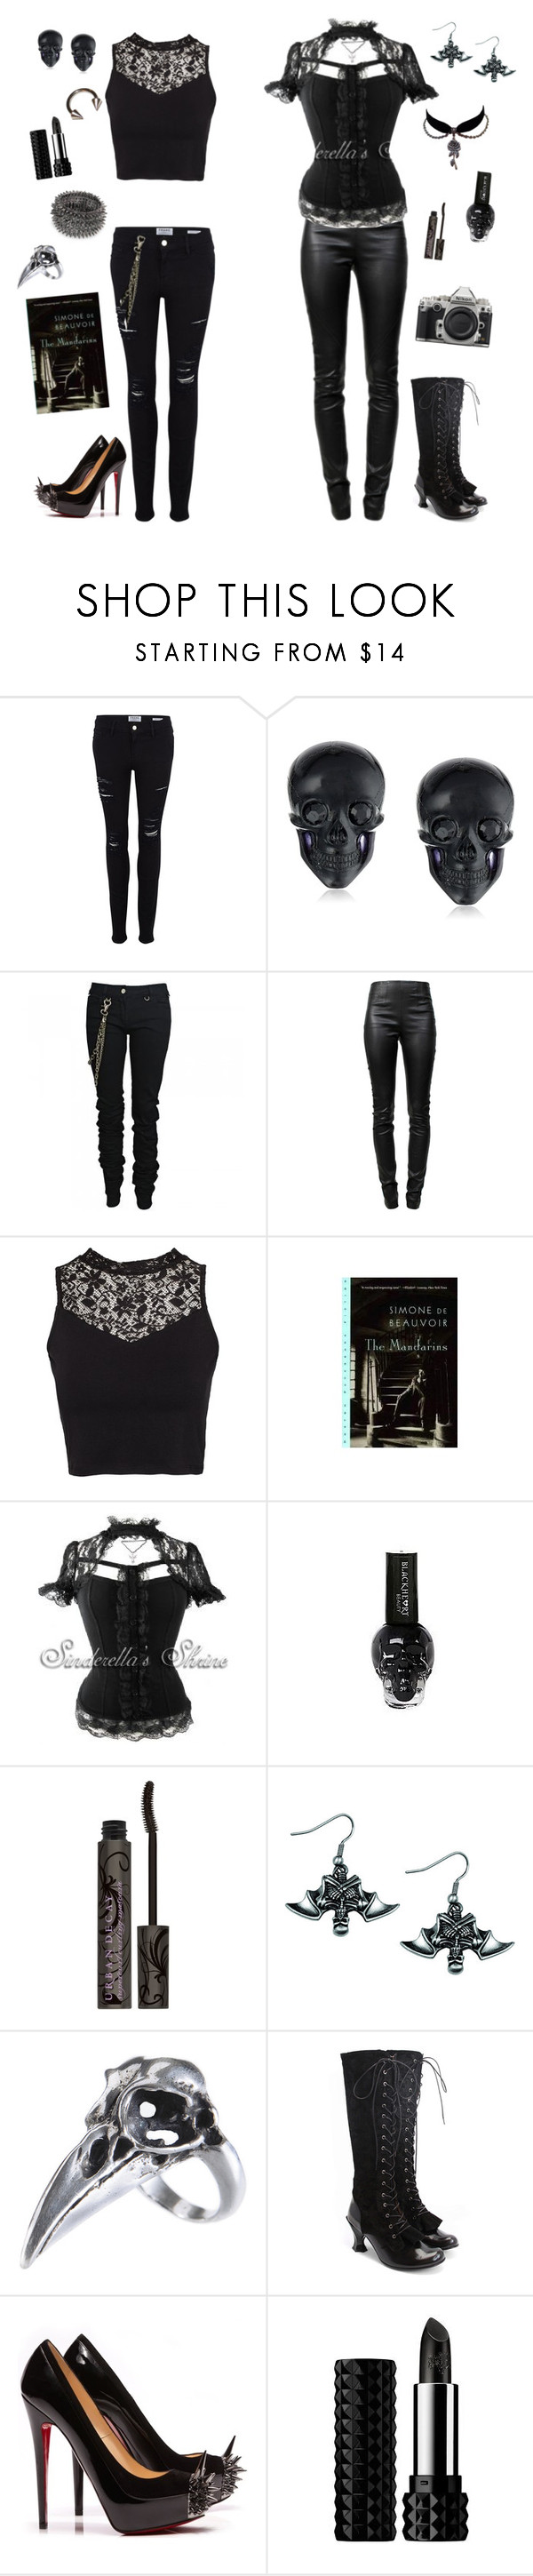 Carmilla Karnstein Outfits